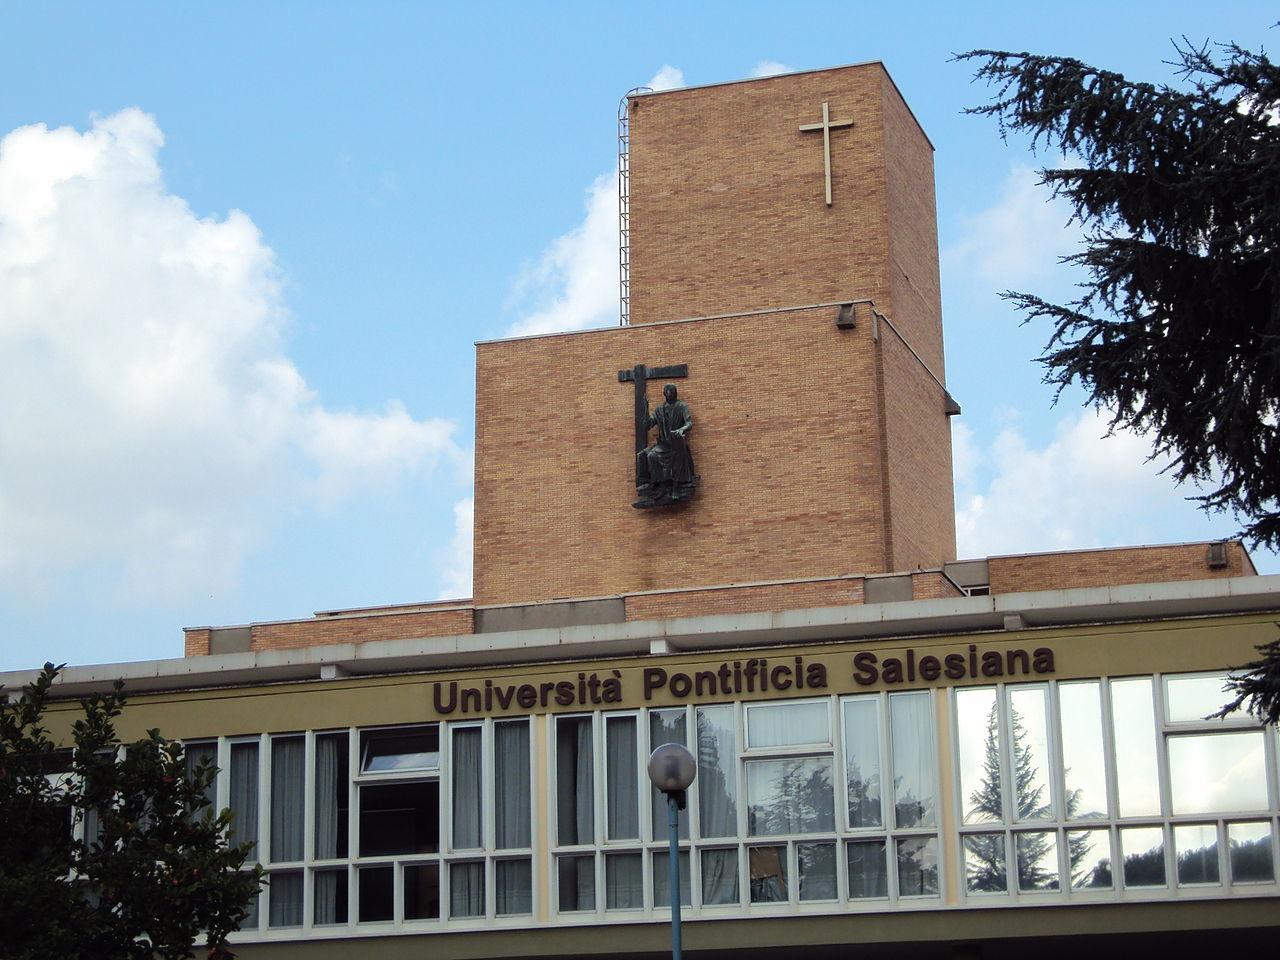 Salesian Pontifical University (Università Pontificia Salesiana (UPS))